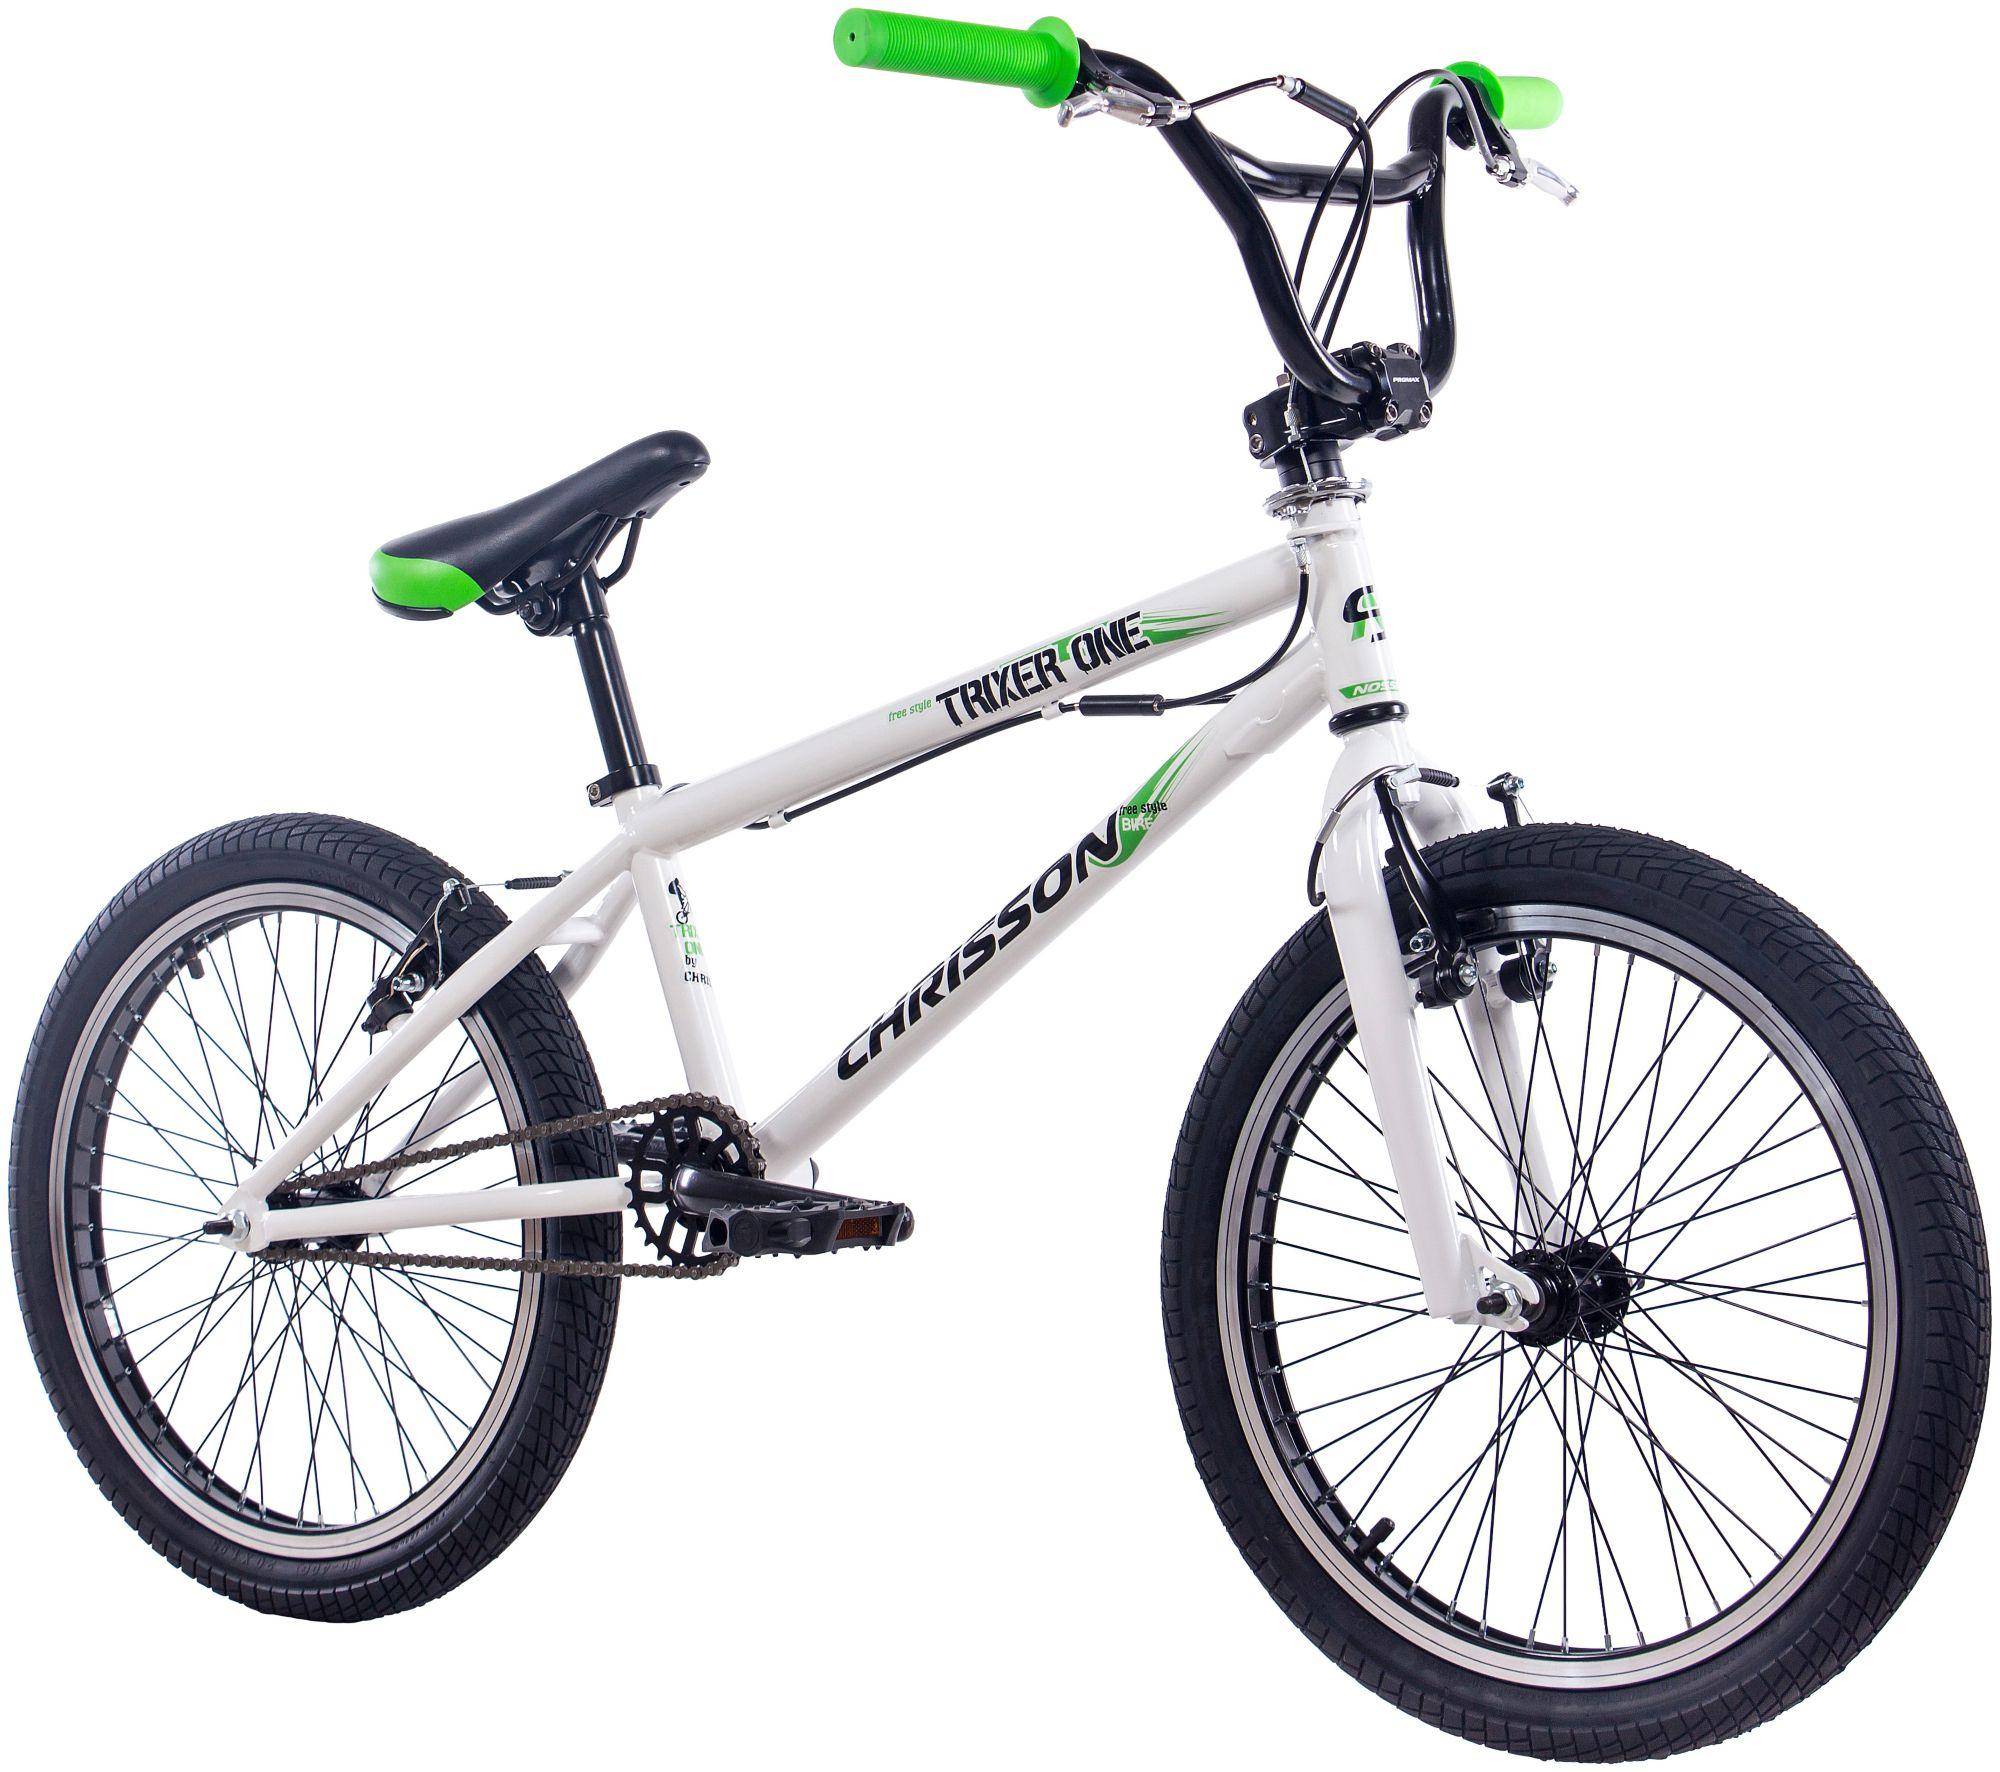 CHRISSON Chrisson BMX » BMX TRIXER ONE«, 20 Zoll, 1 Gang, V-Bremsen